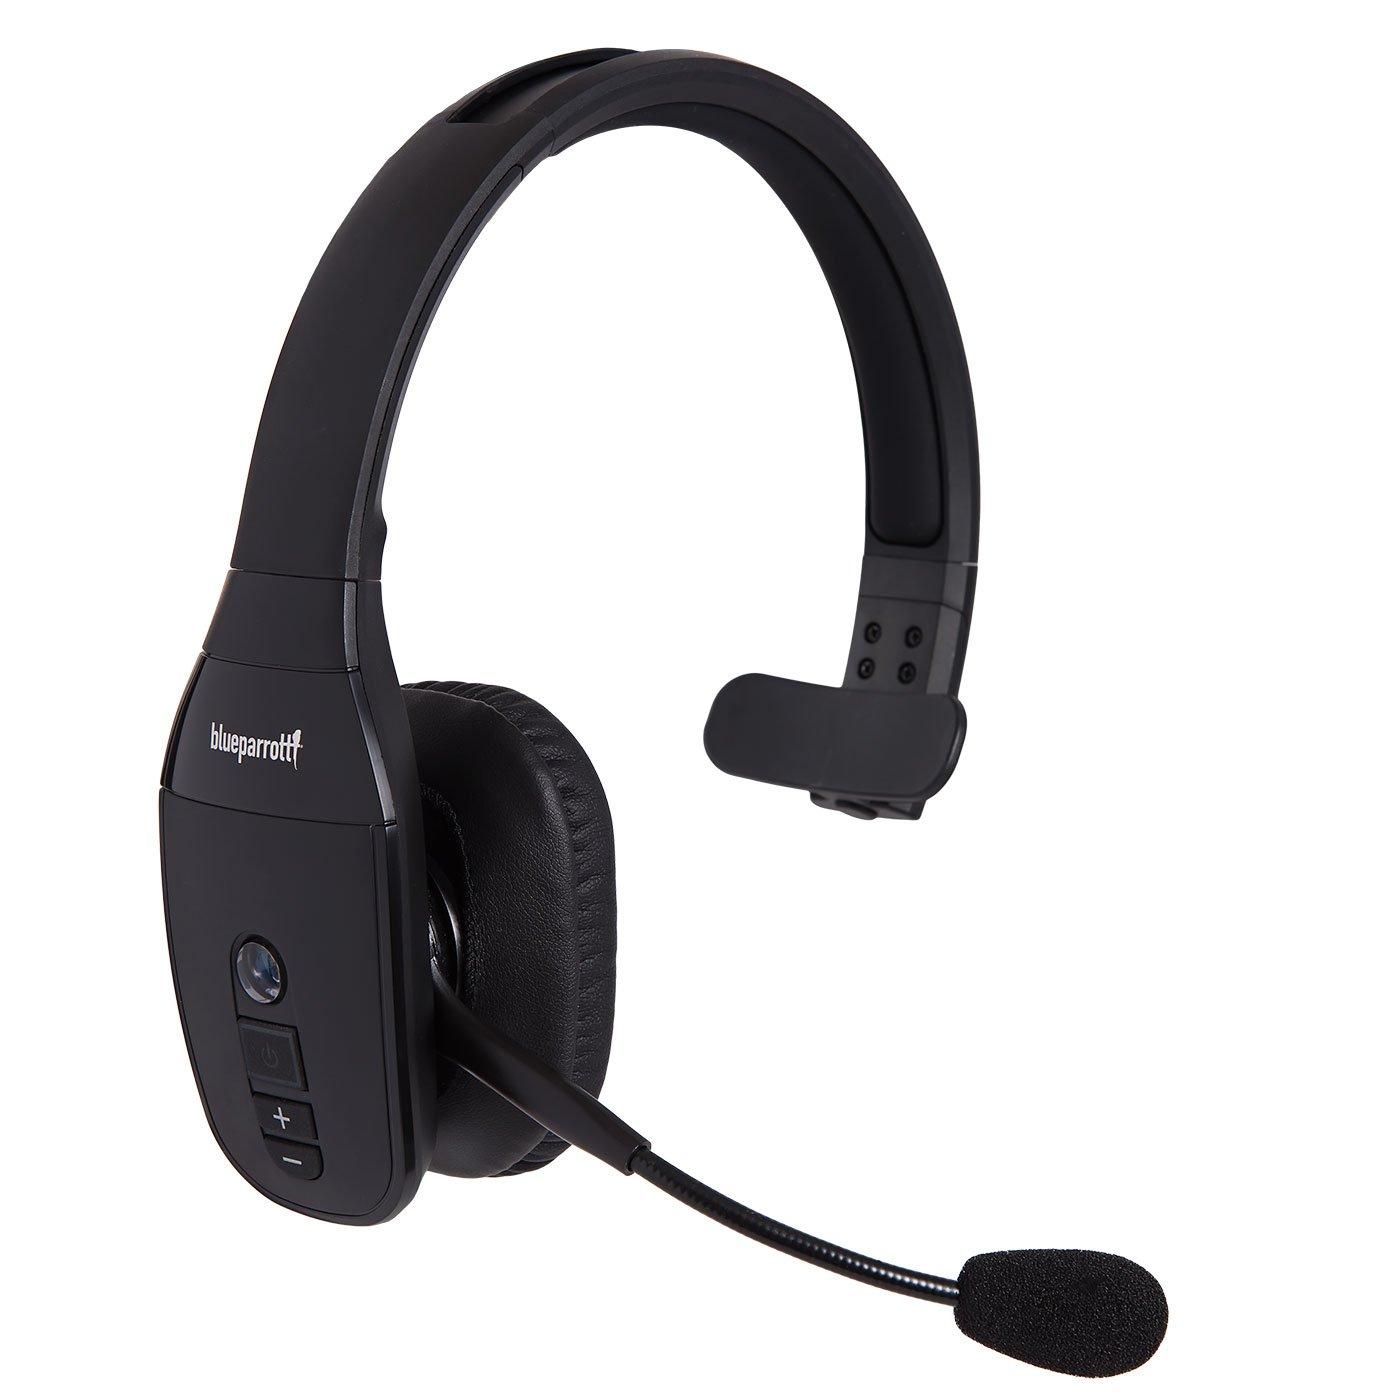 BlueParrott B450 XT Canceling Bluetooth Headset